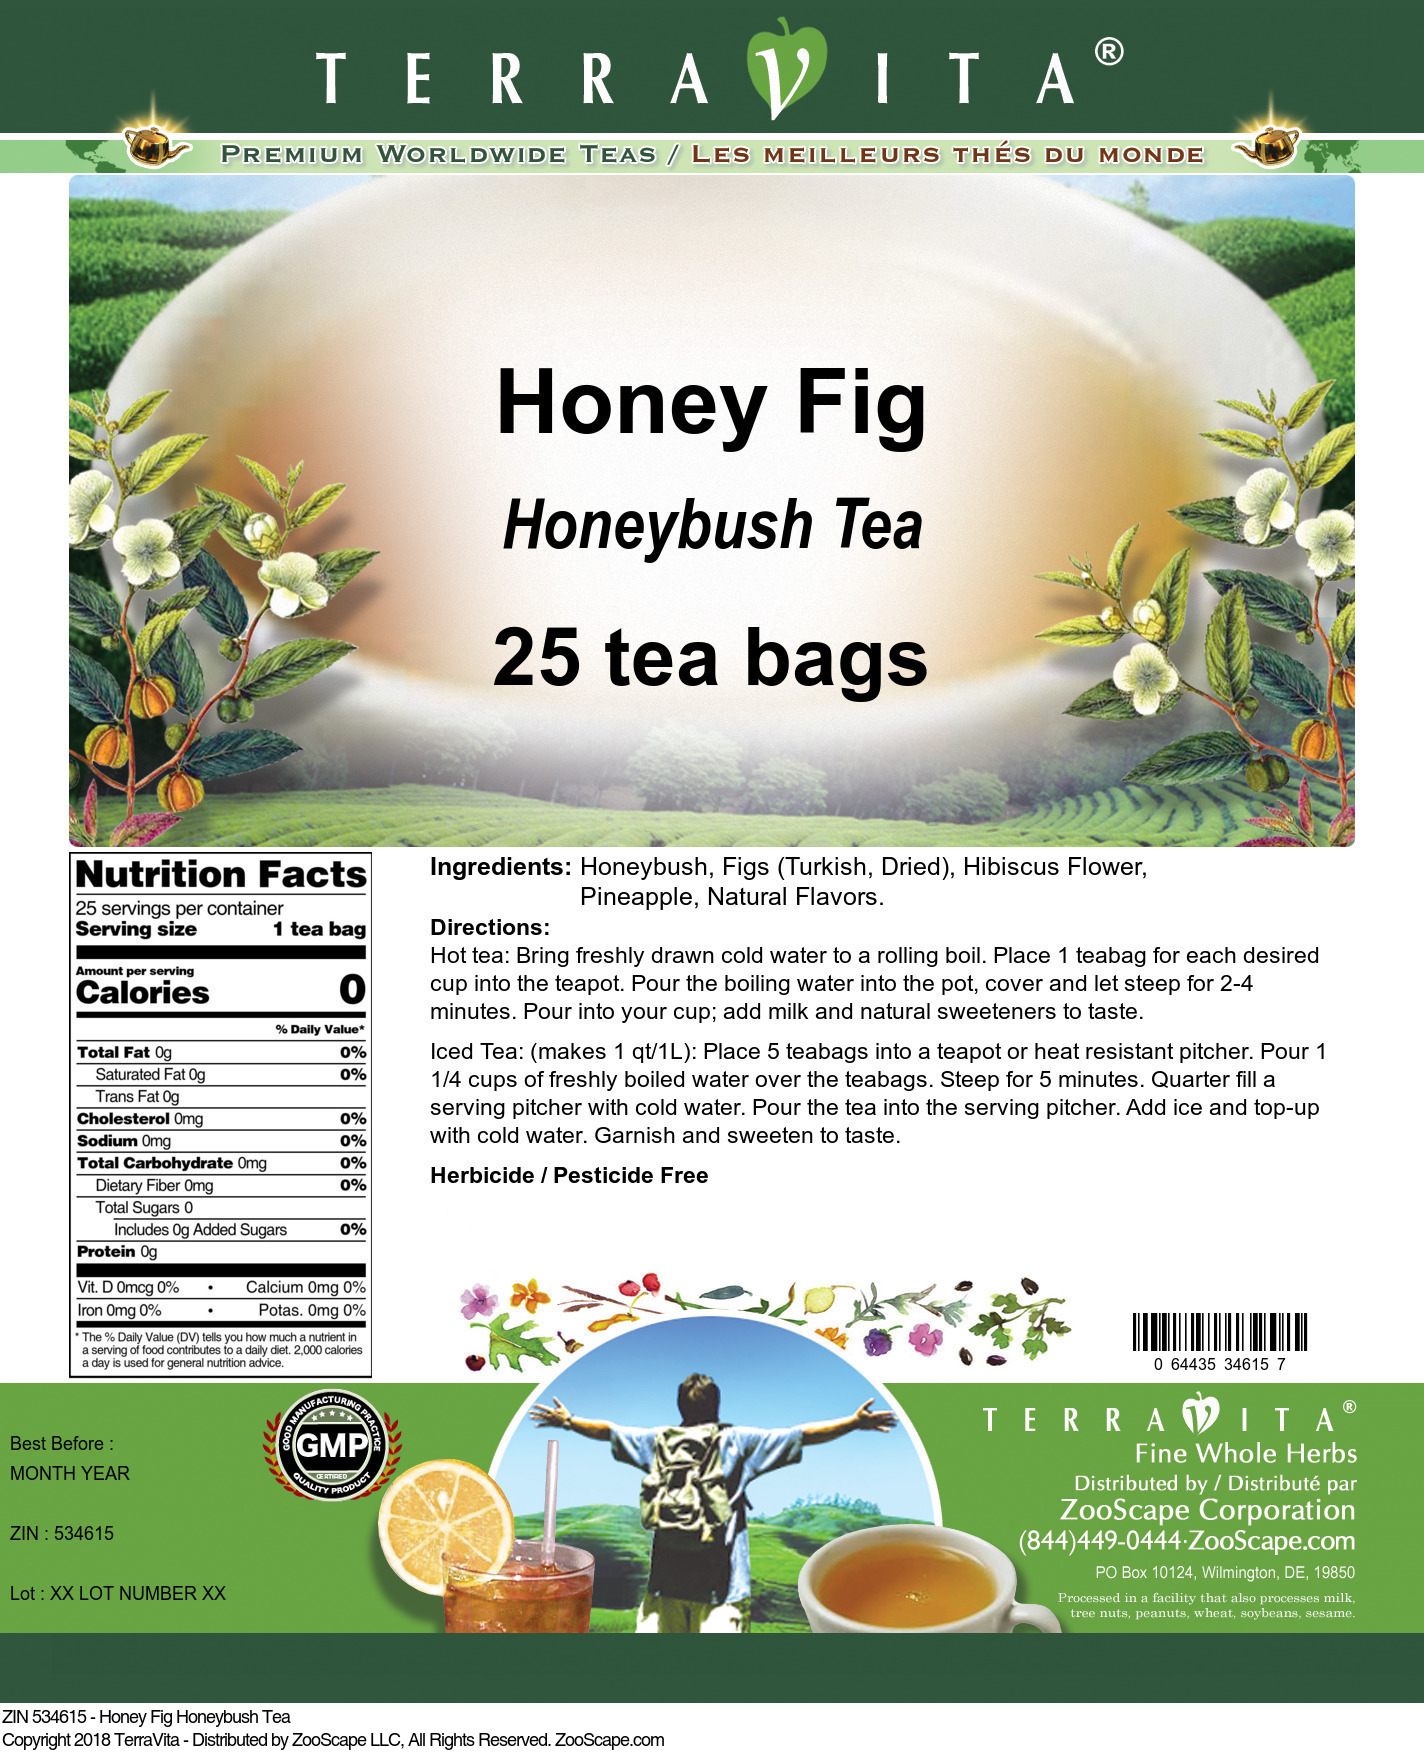 Honey Fig Honeybush Tea